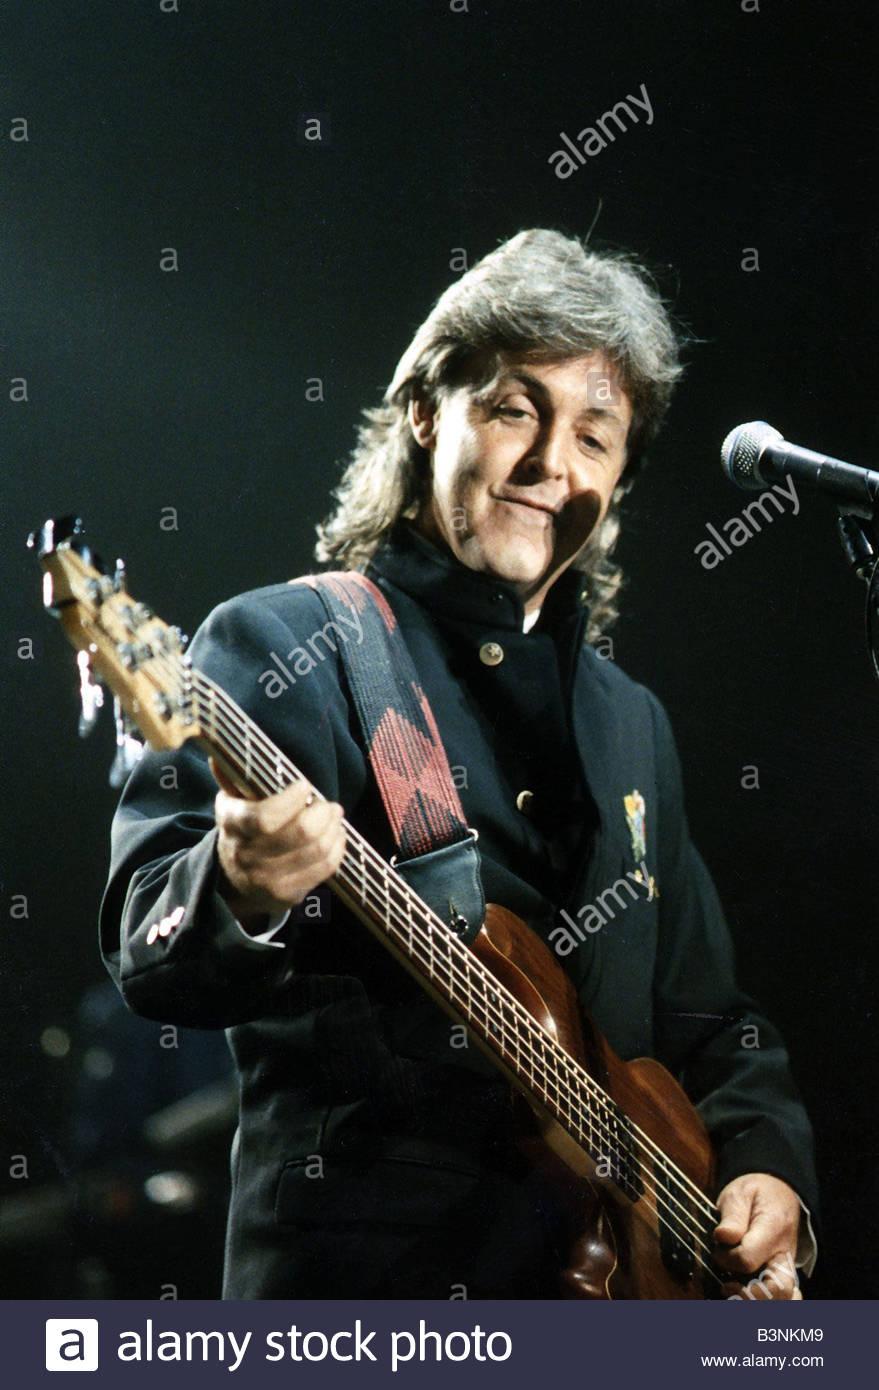 Paul McCartney Singer Former Members Of The Beatles Wings Singing Playing Bass Guitar In Concert September 1989